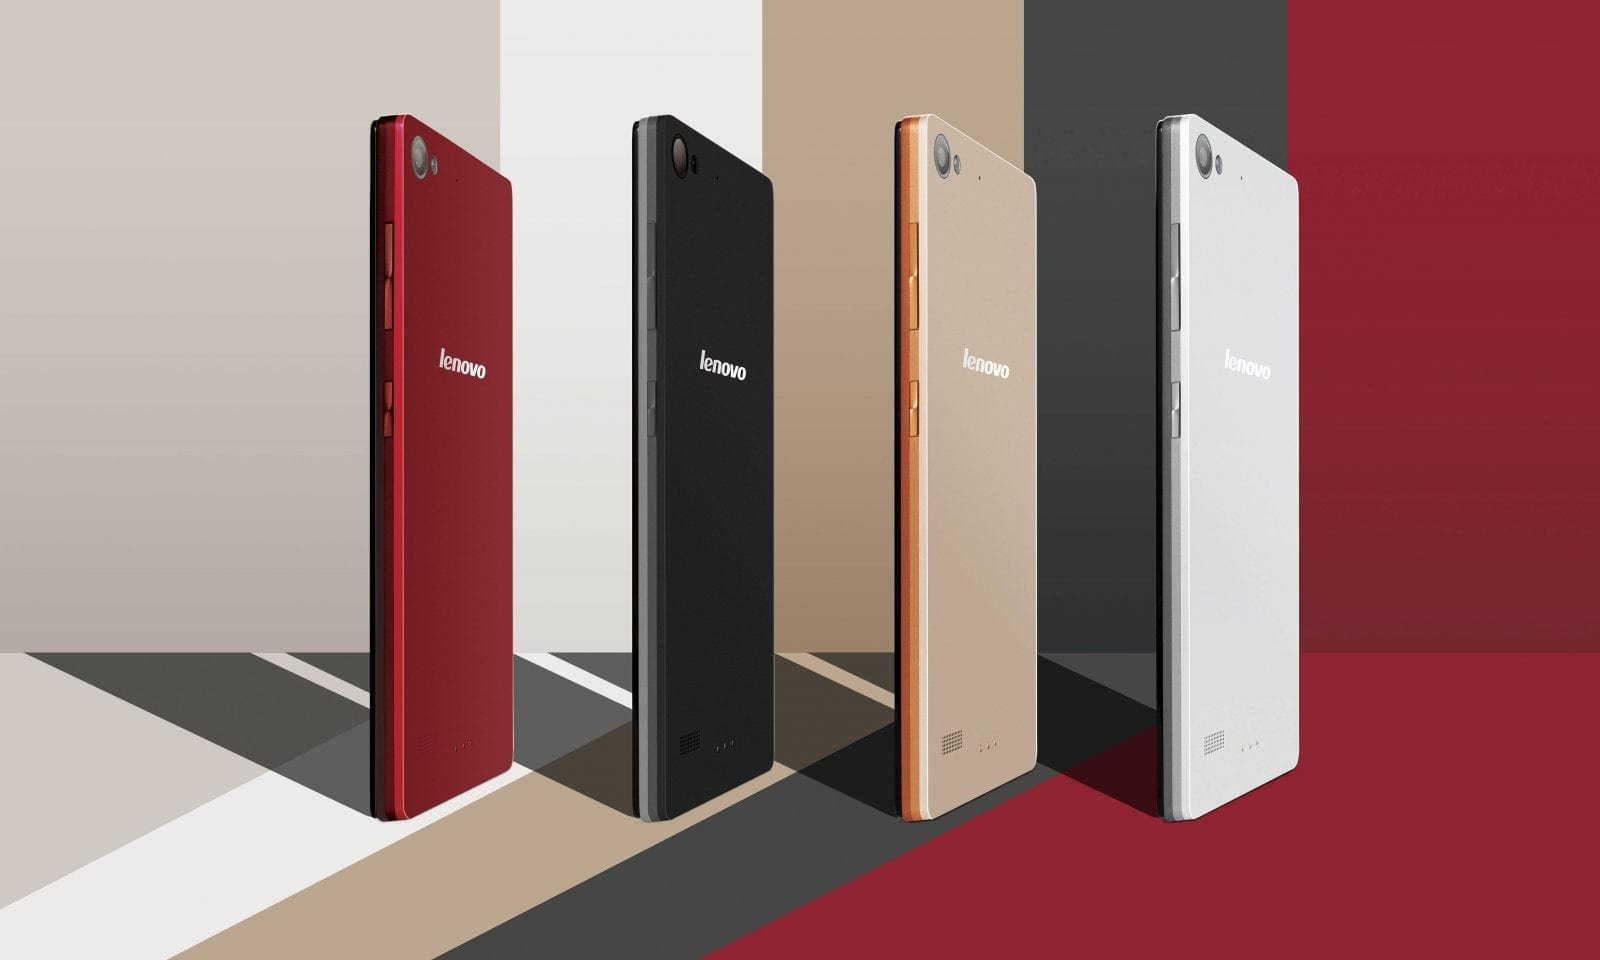 Lenovo VIBE X2 2 - Lenovo VIBE X2 și 5 aplicații destinate fashionistelor